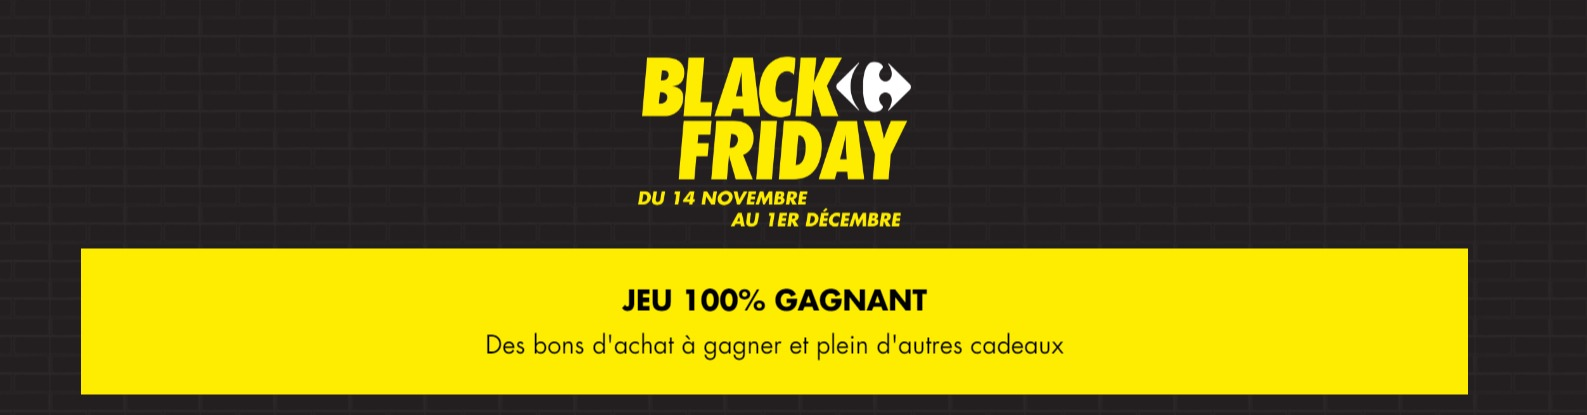 Jeux concours Black Friday - Carrefour fr.jpg